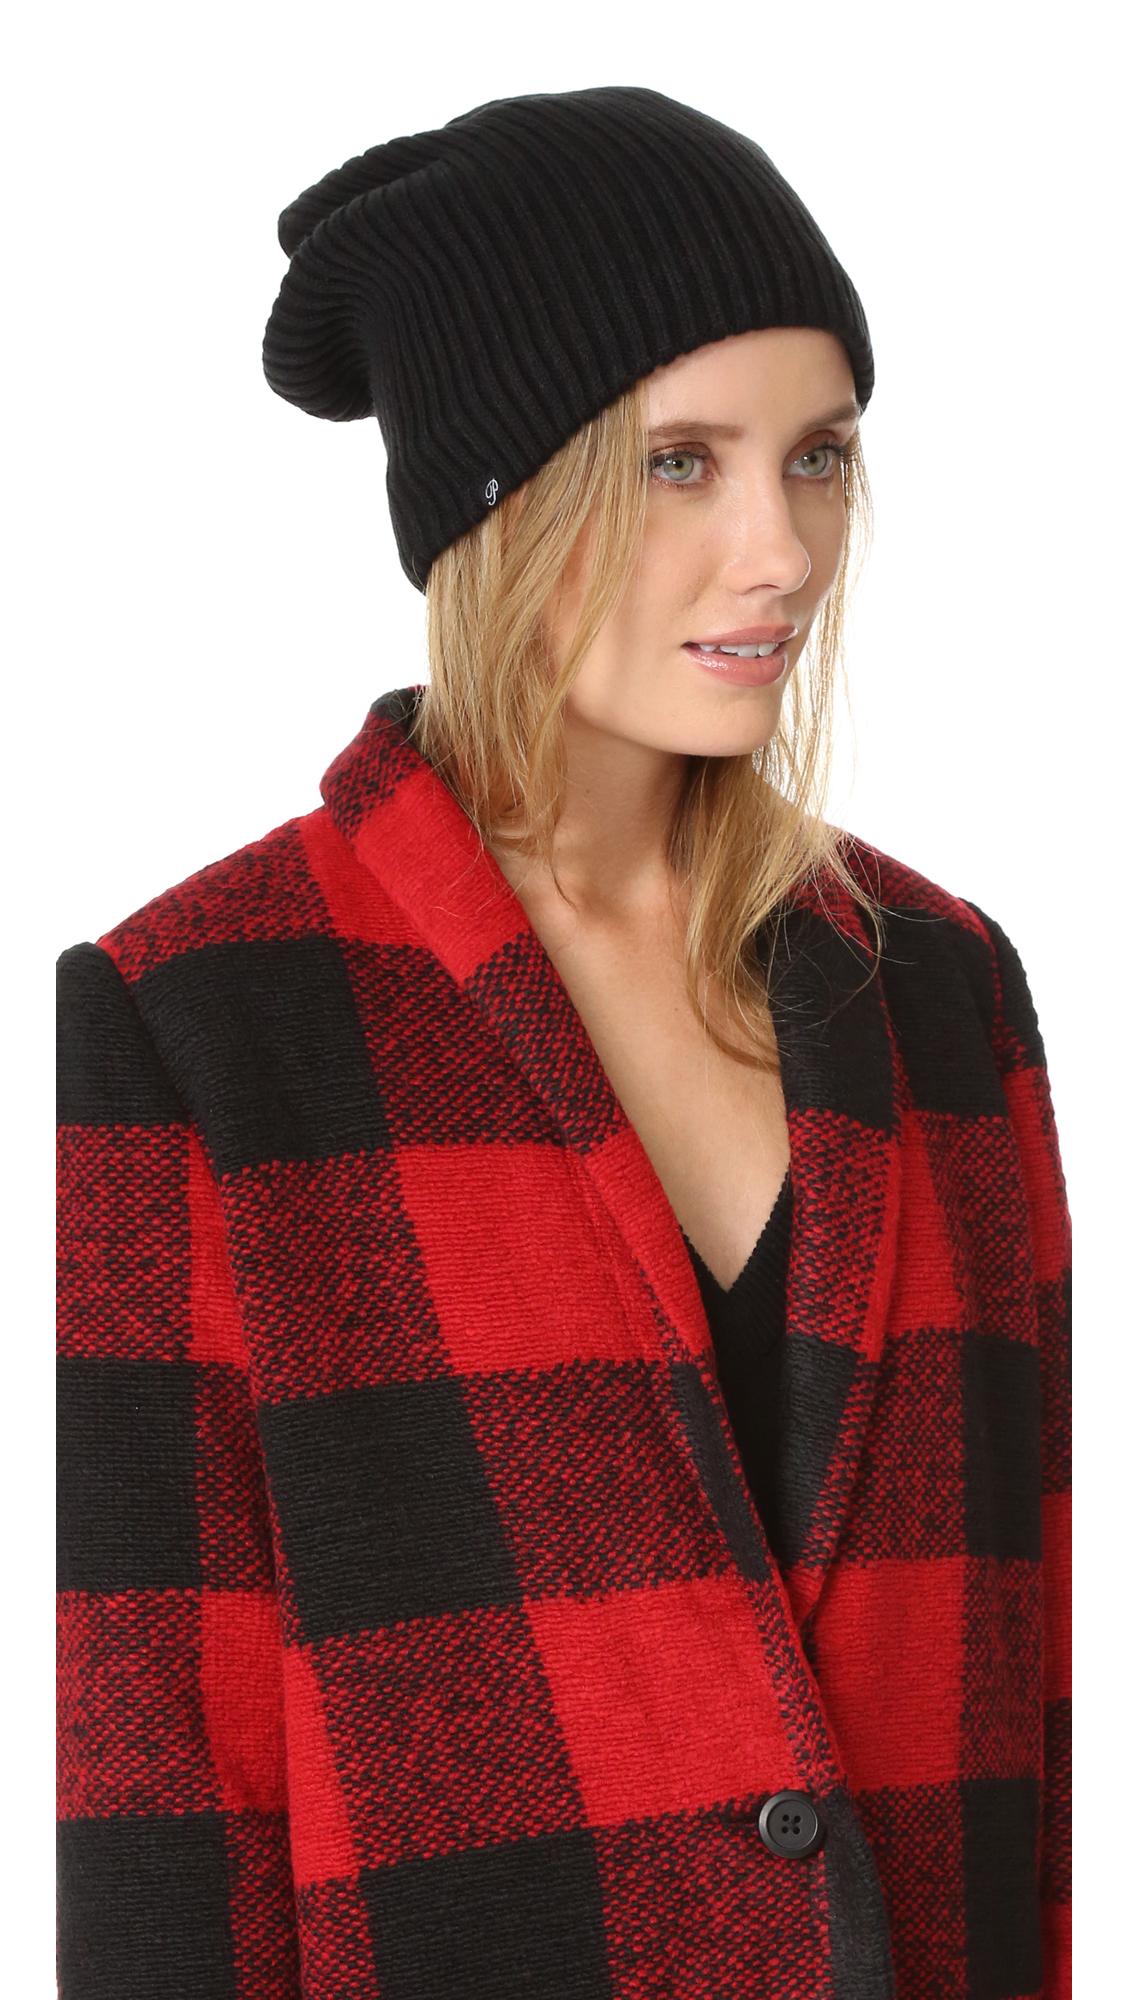 Plush Ribbed Fleece Lined Beanie - Black